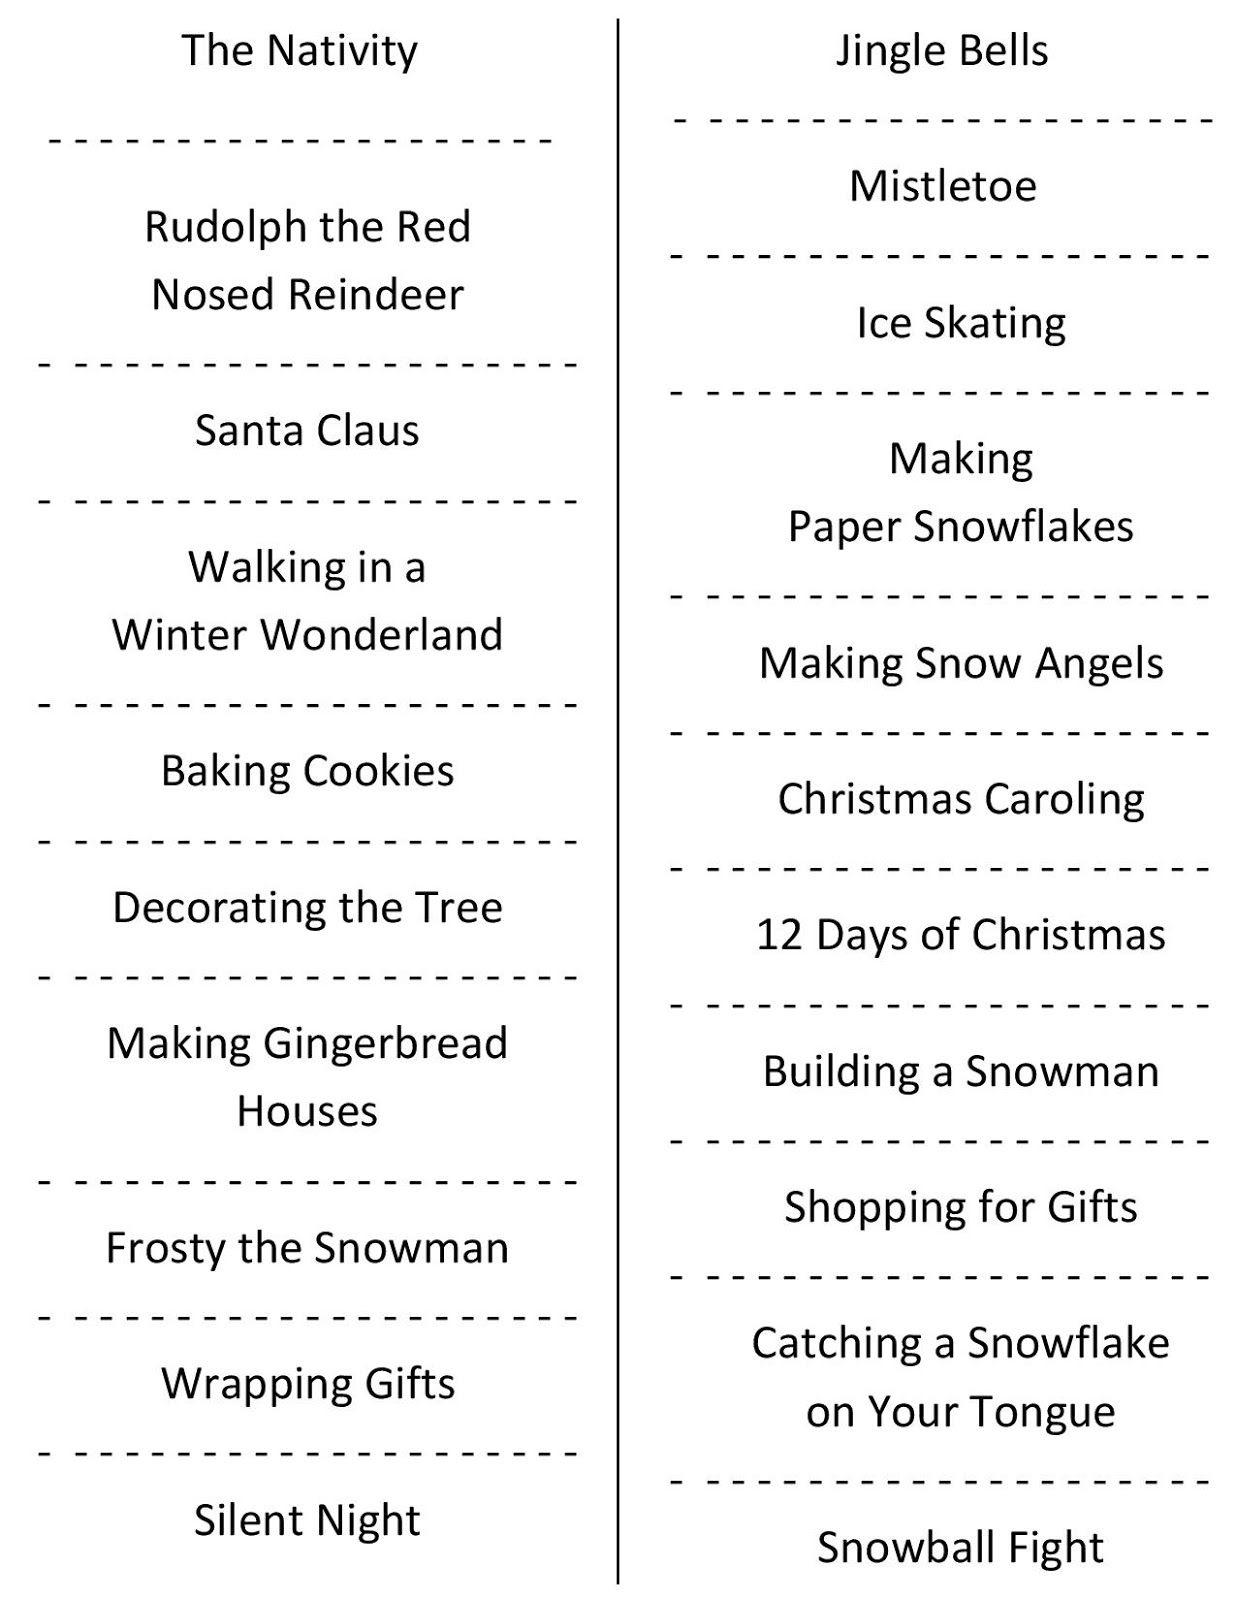 Christmas Charades (Free Printable Party Game)   Christmas   Holiday - Free Printable Charades Cards